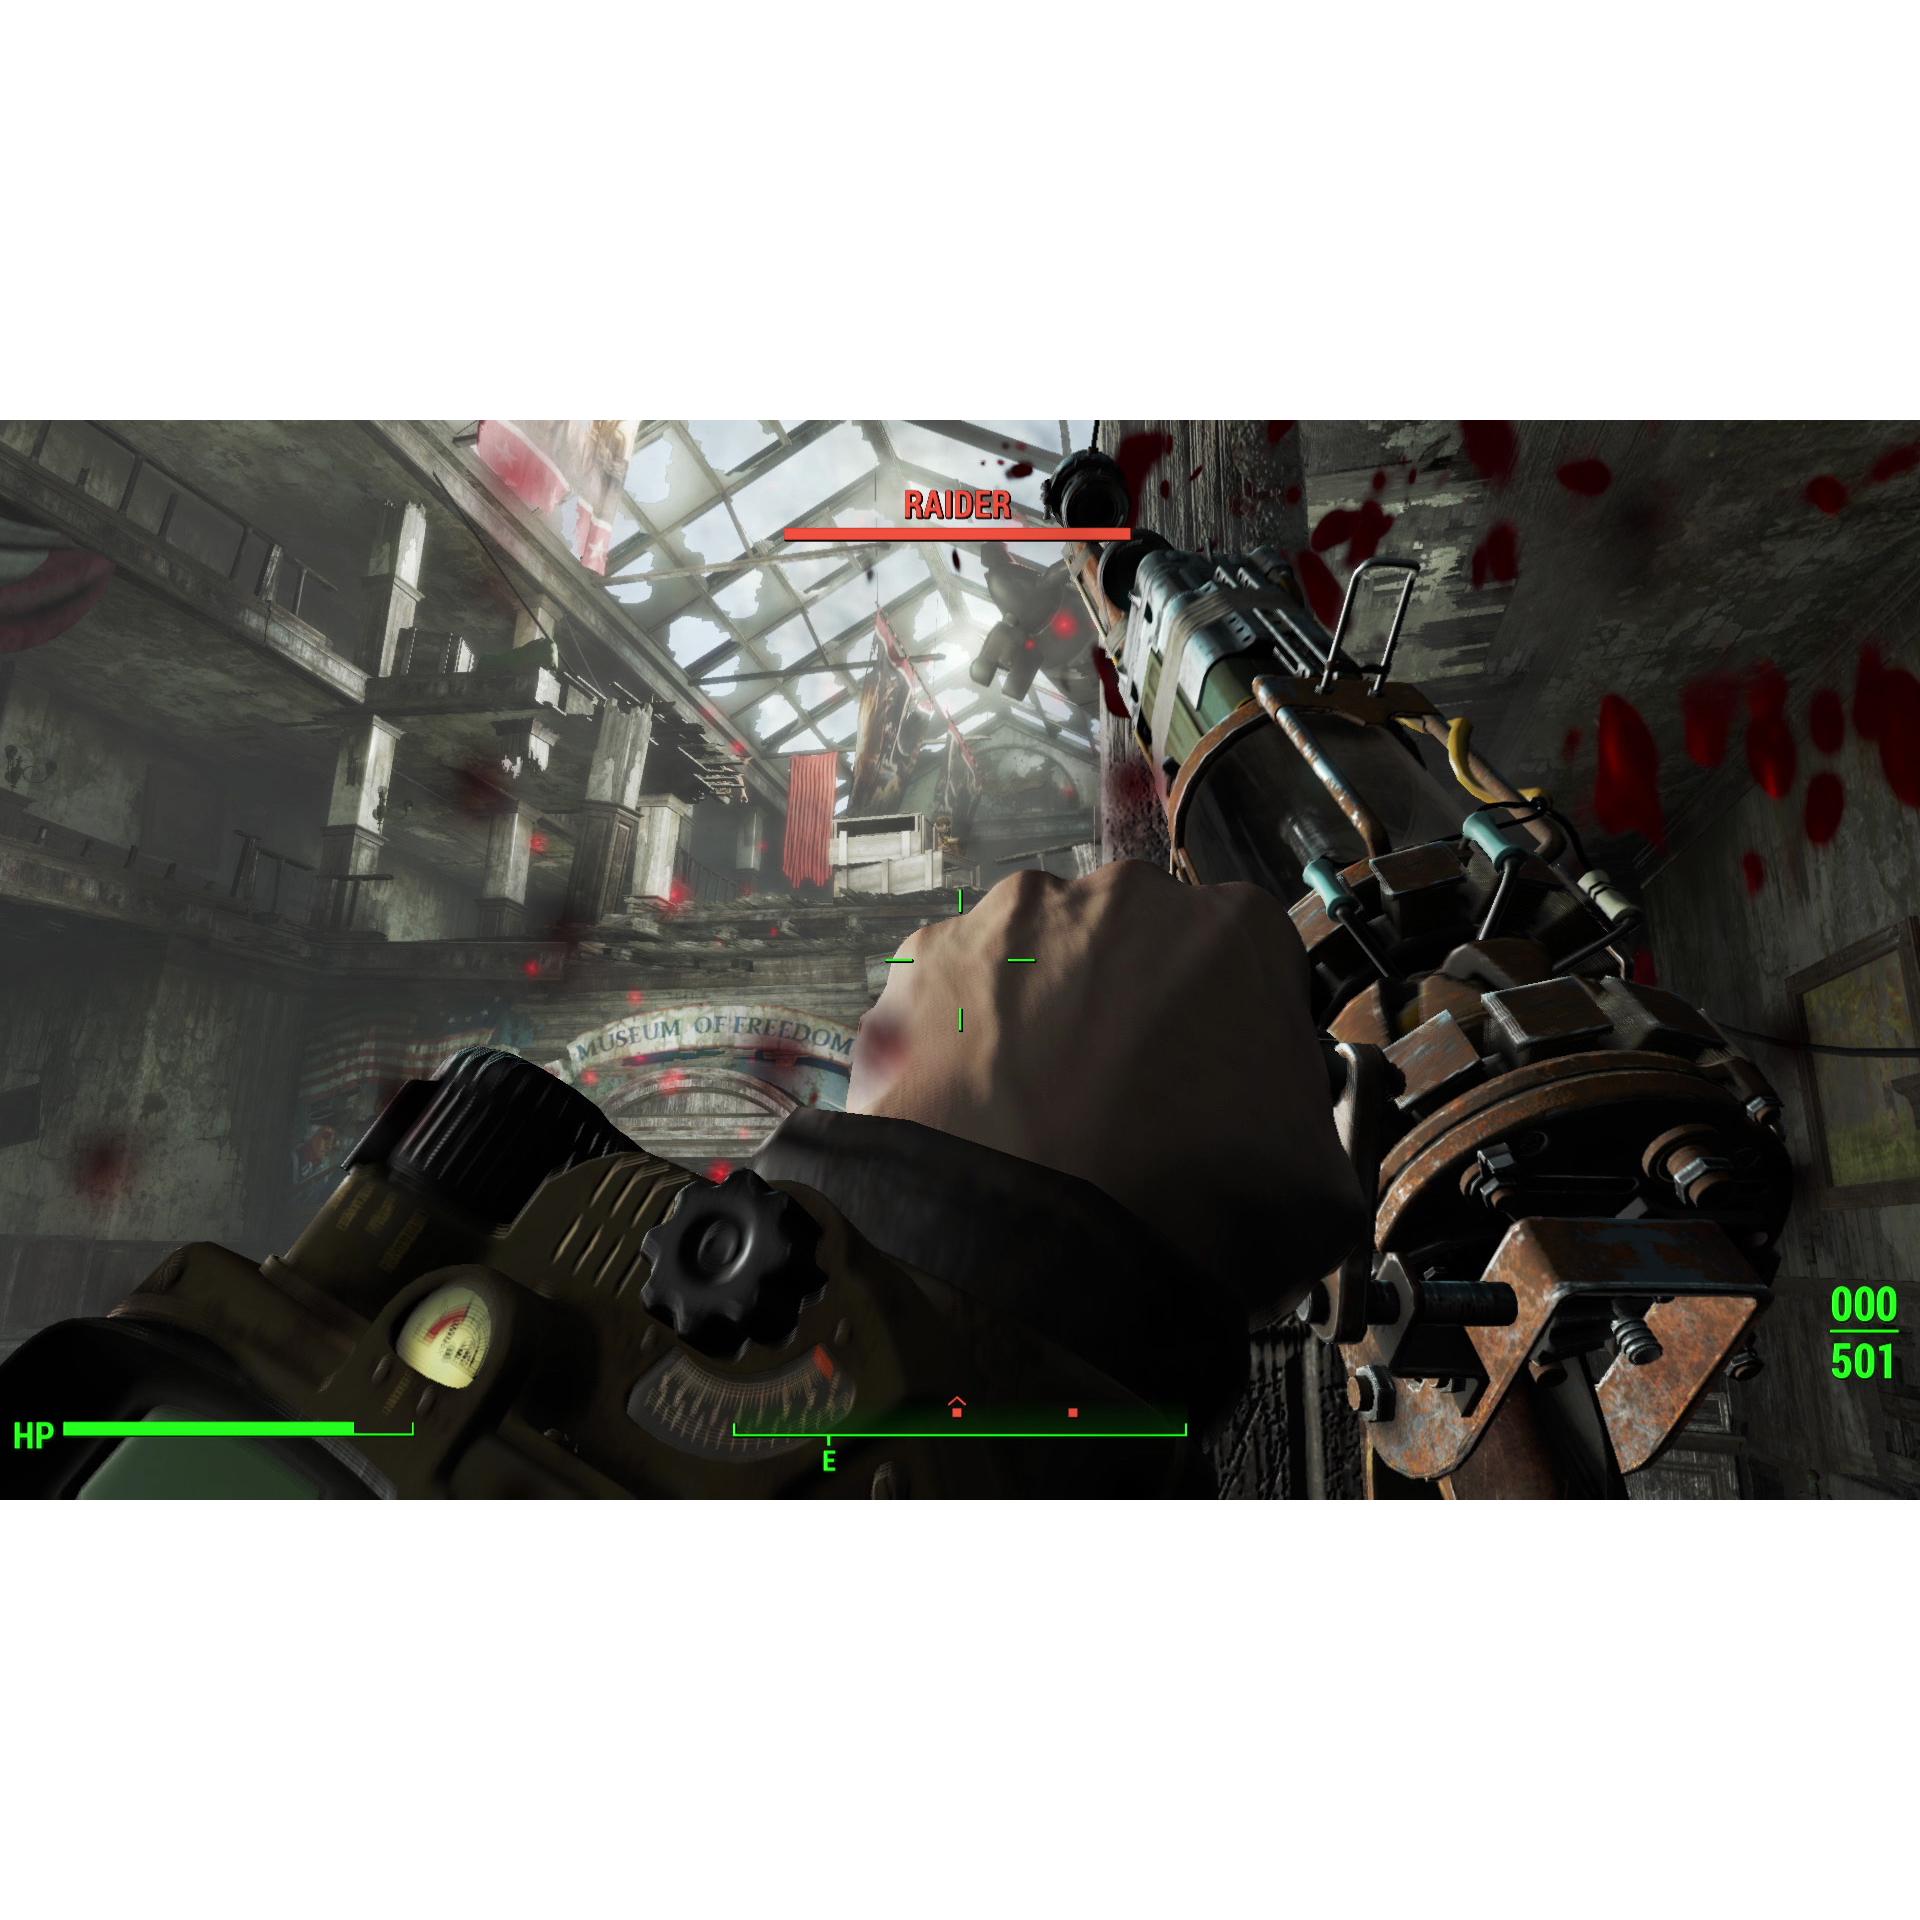 Joc Fallout 4 Goty pentru PlayStation 4 26